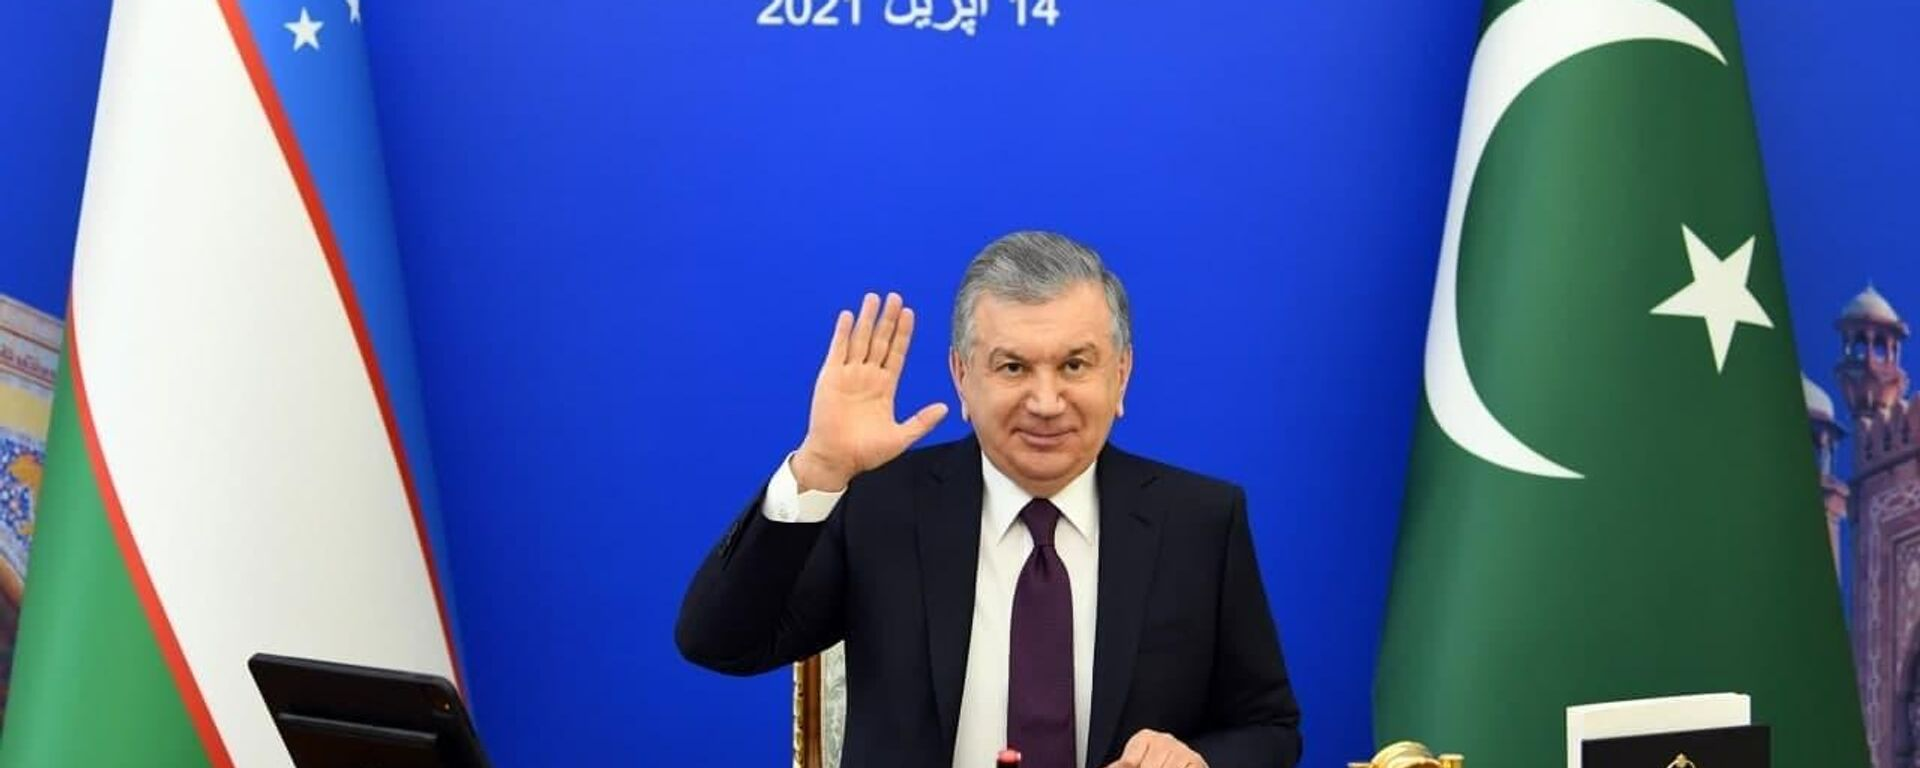 Шавкат Мирзиёев приветствует  Имрана Хана на саммите в режиме видеосвязи - Sputnik Узбекистан, 1920, 14.04.2021